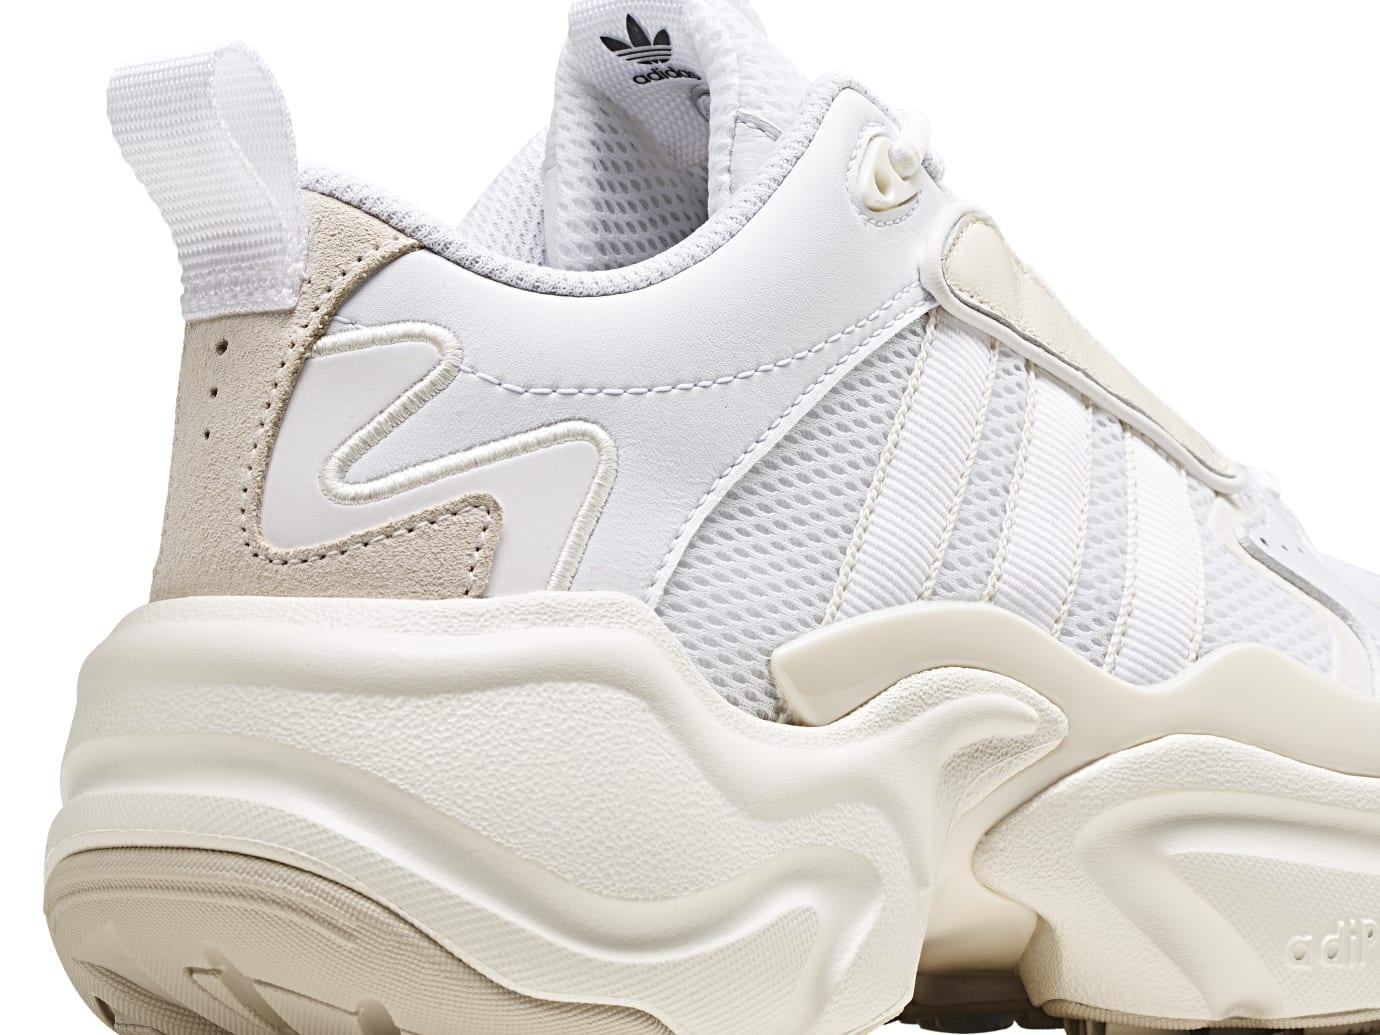 Adidas Consortium Communitas Naked Magmur Runner G54683 (Heel)